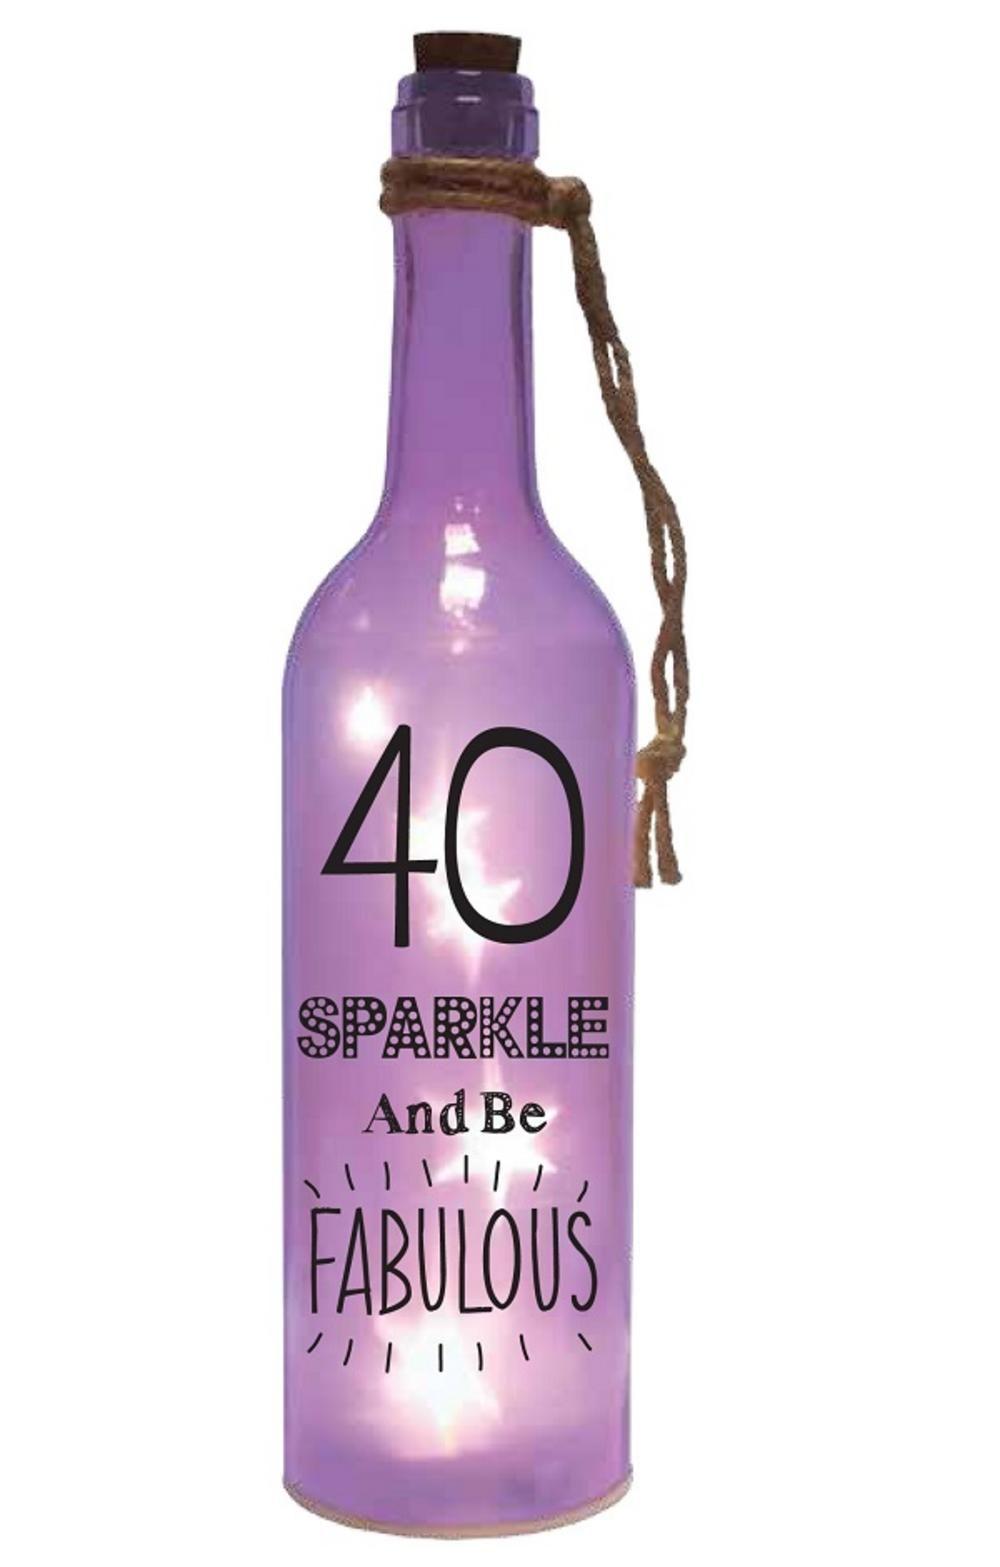 40th Birthday Starlight Bottle Pink Glass Light Up Sentimental Message Bottles